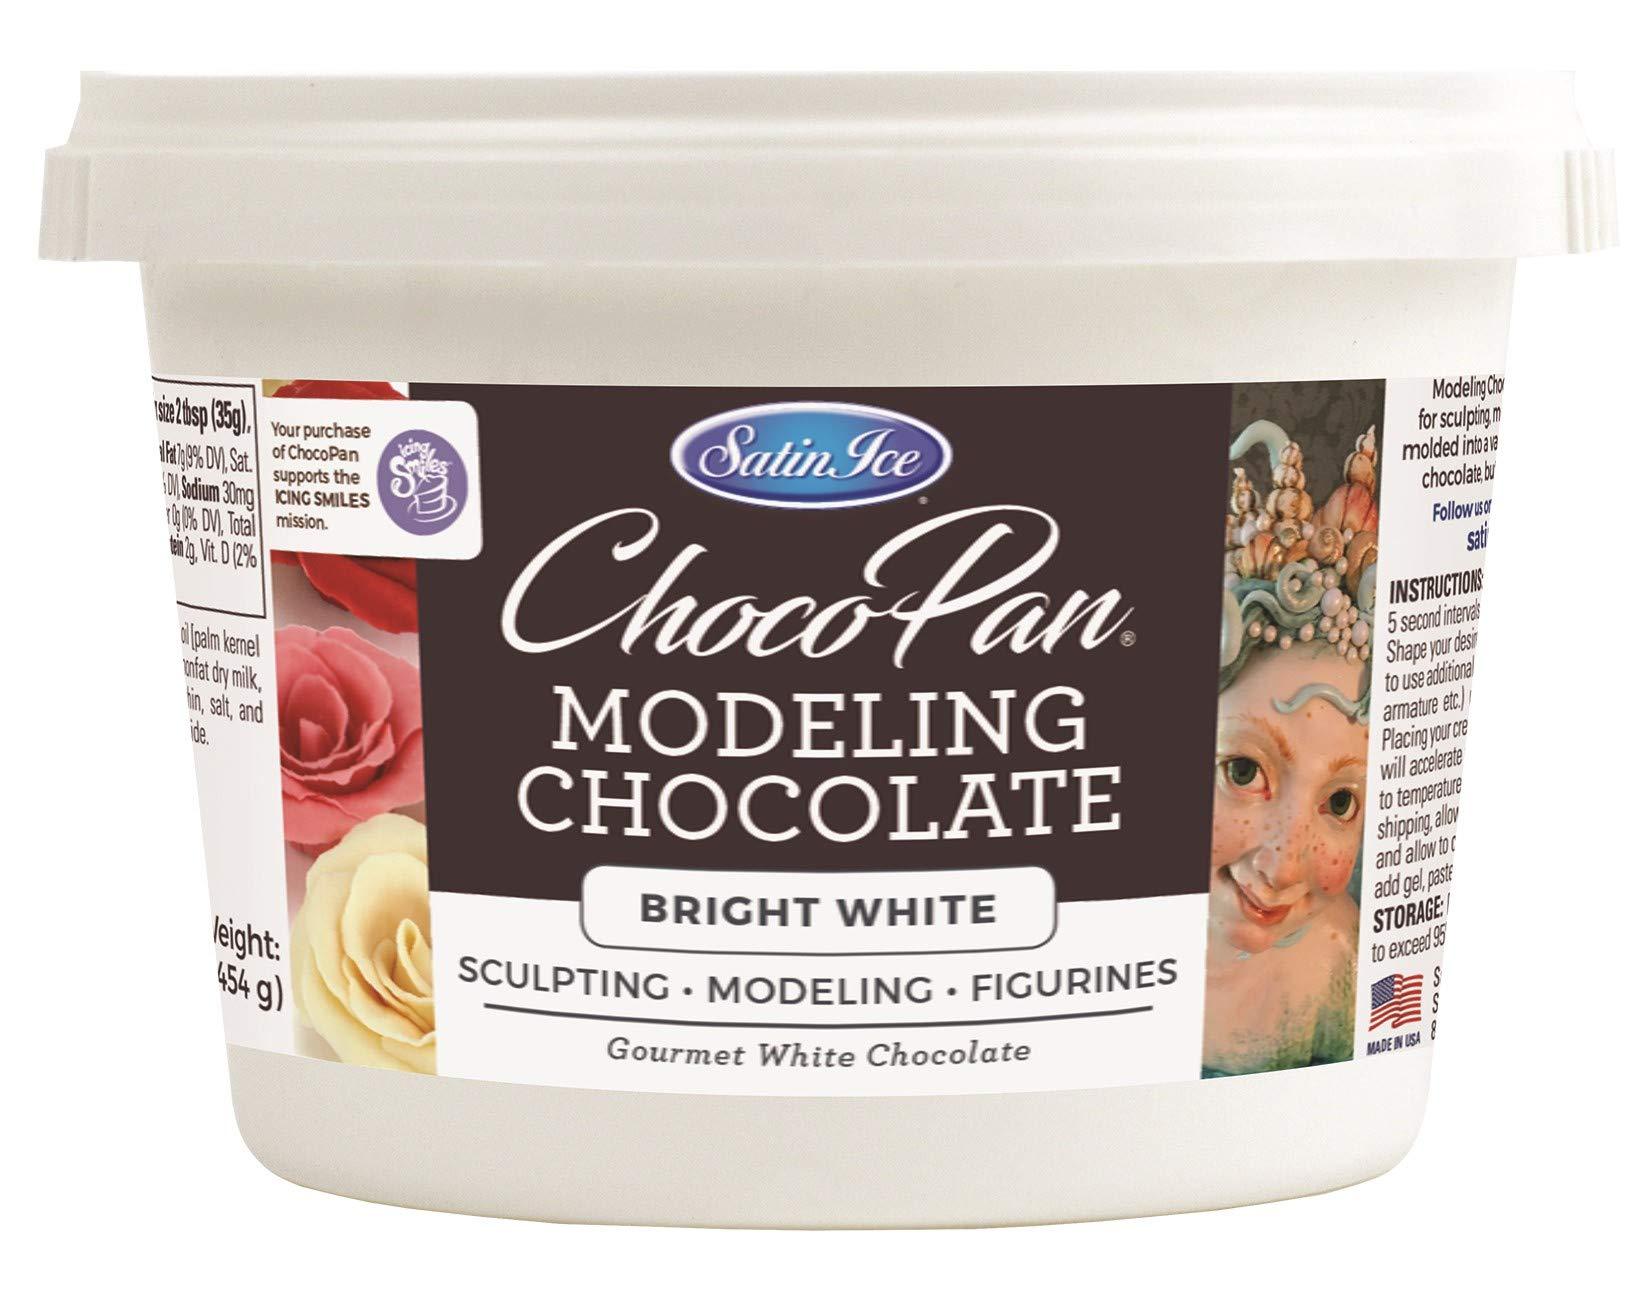 Satin Ice ChocoPan Bright White Modeling Chocolate, 1 Pound